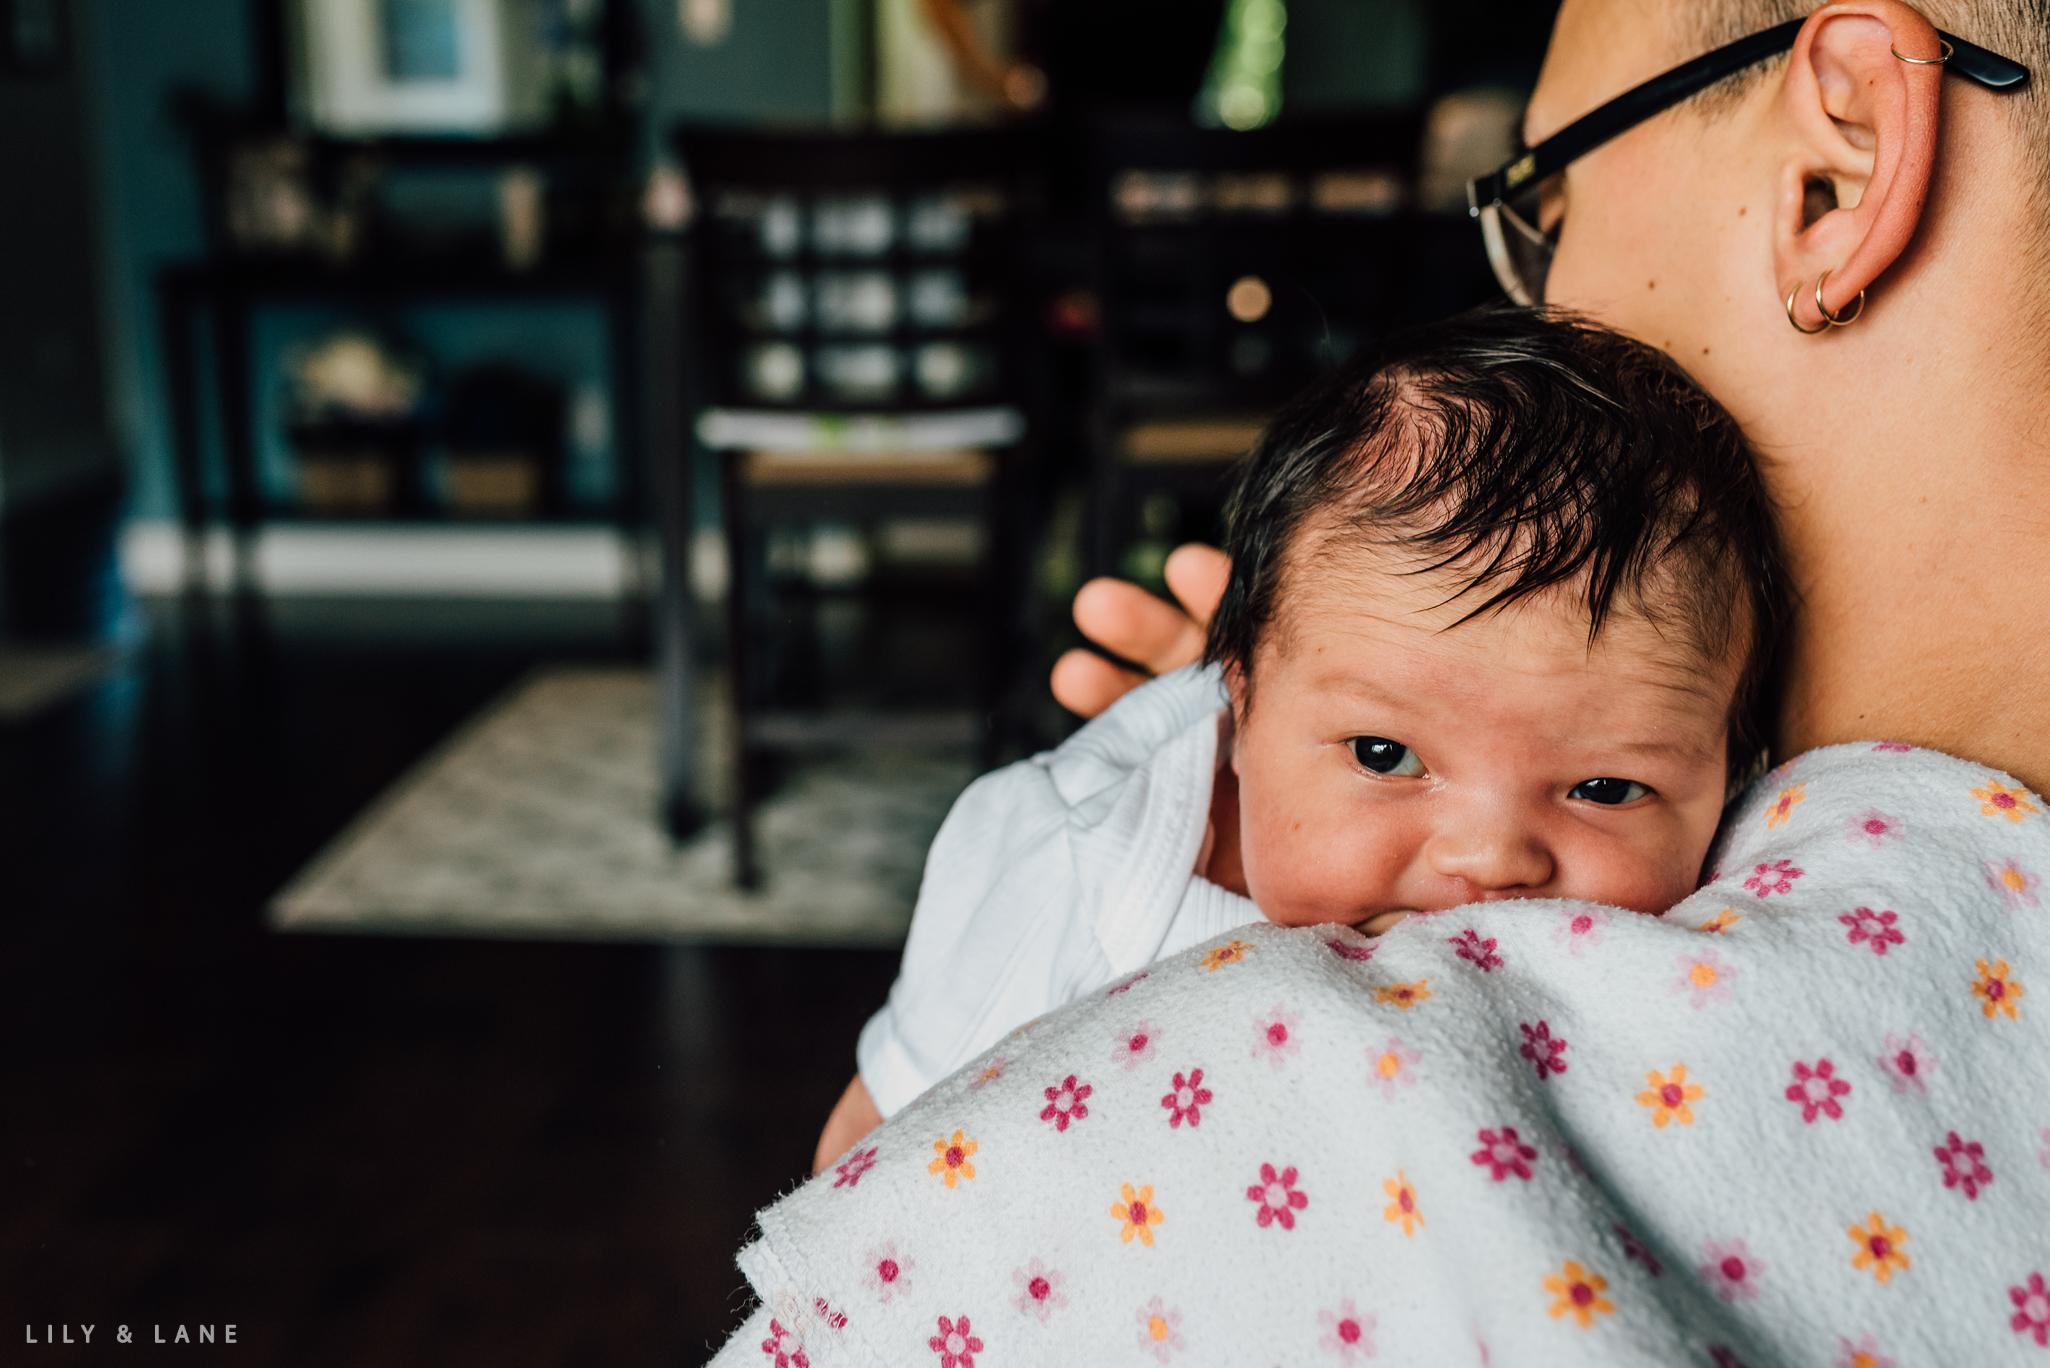 Nicola_Reiersen_Photography_Victoria_BC_Newborn_Photographer.jpg